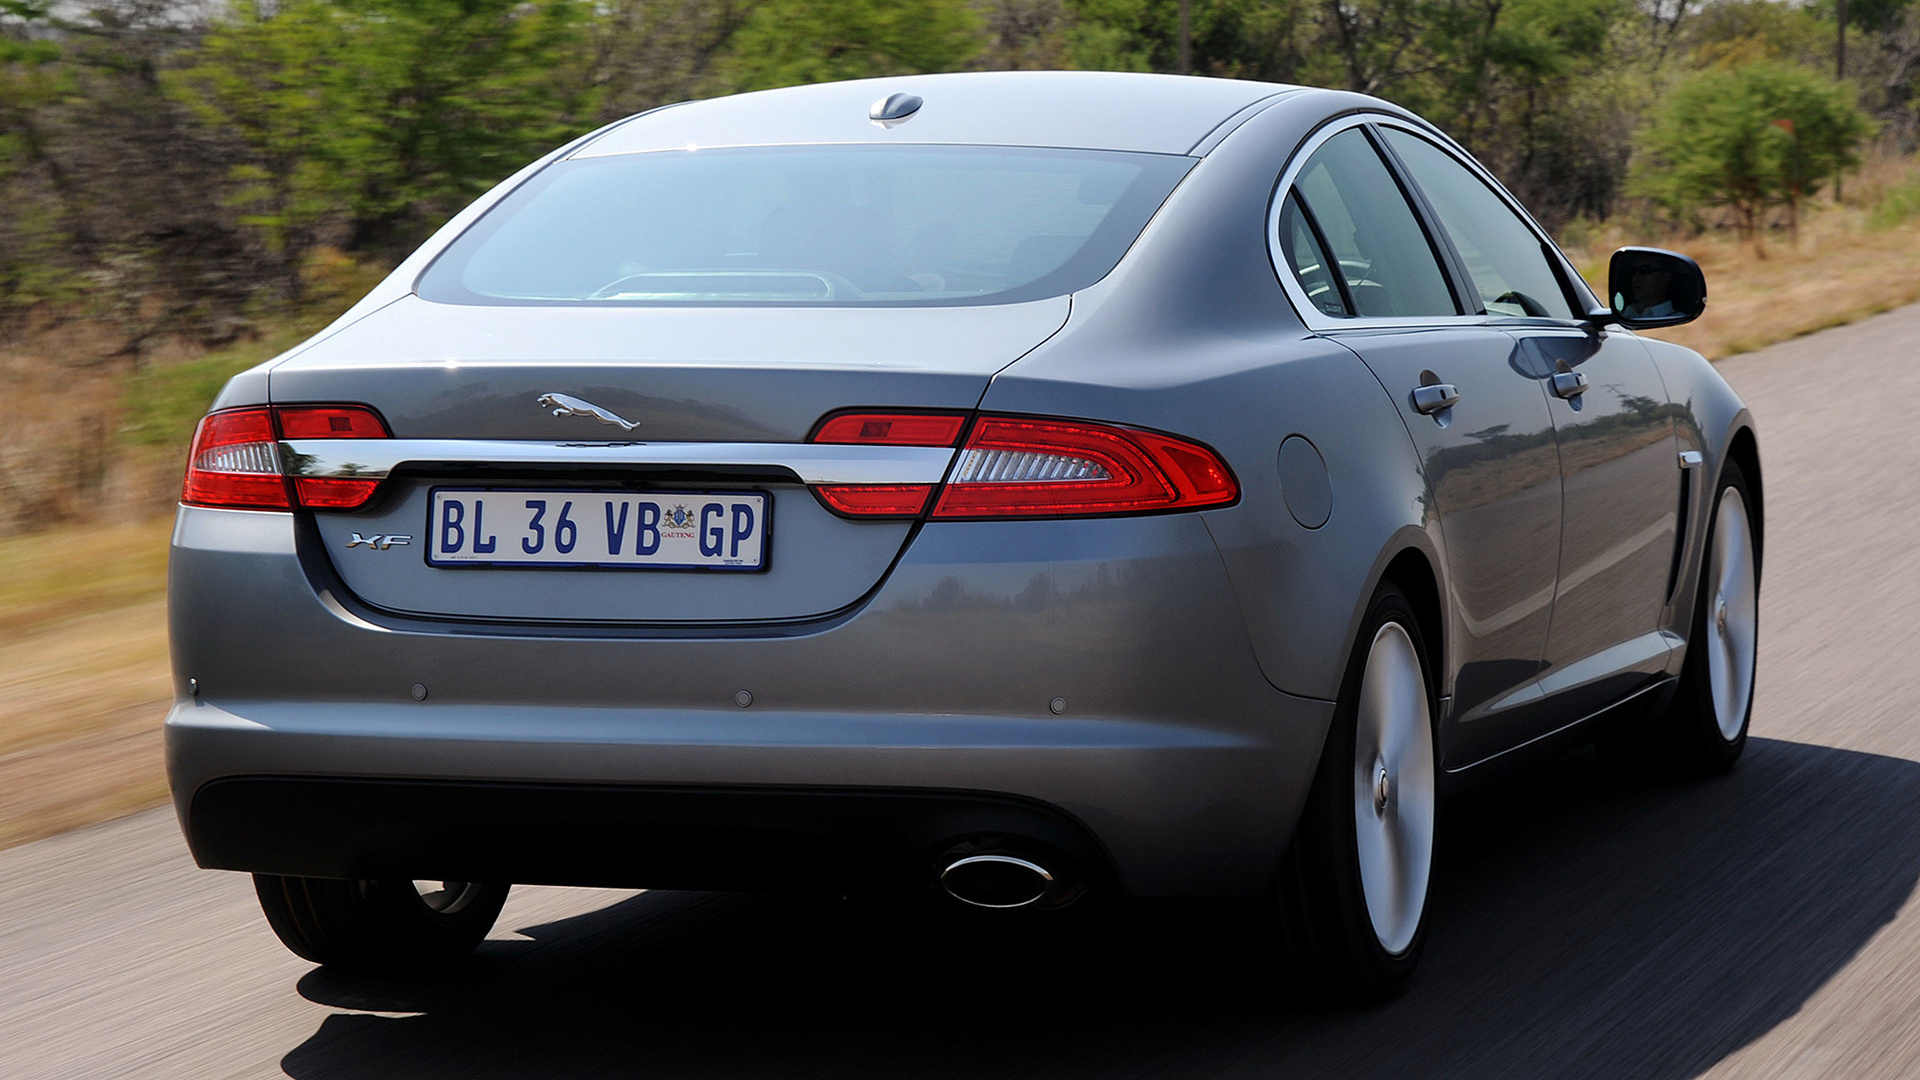 2011 Jaguar Xf Za Wallpapers And Hd Images Car Pixel